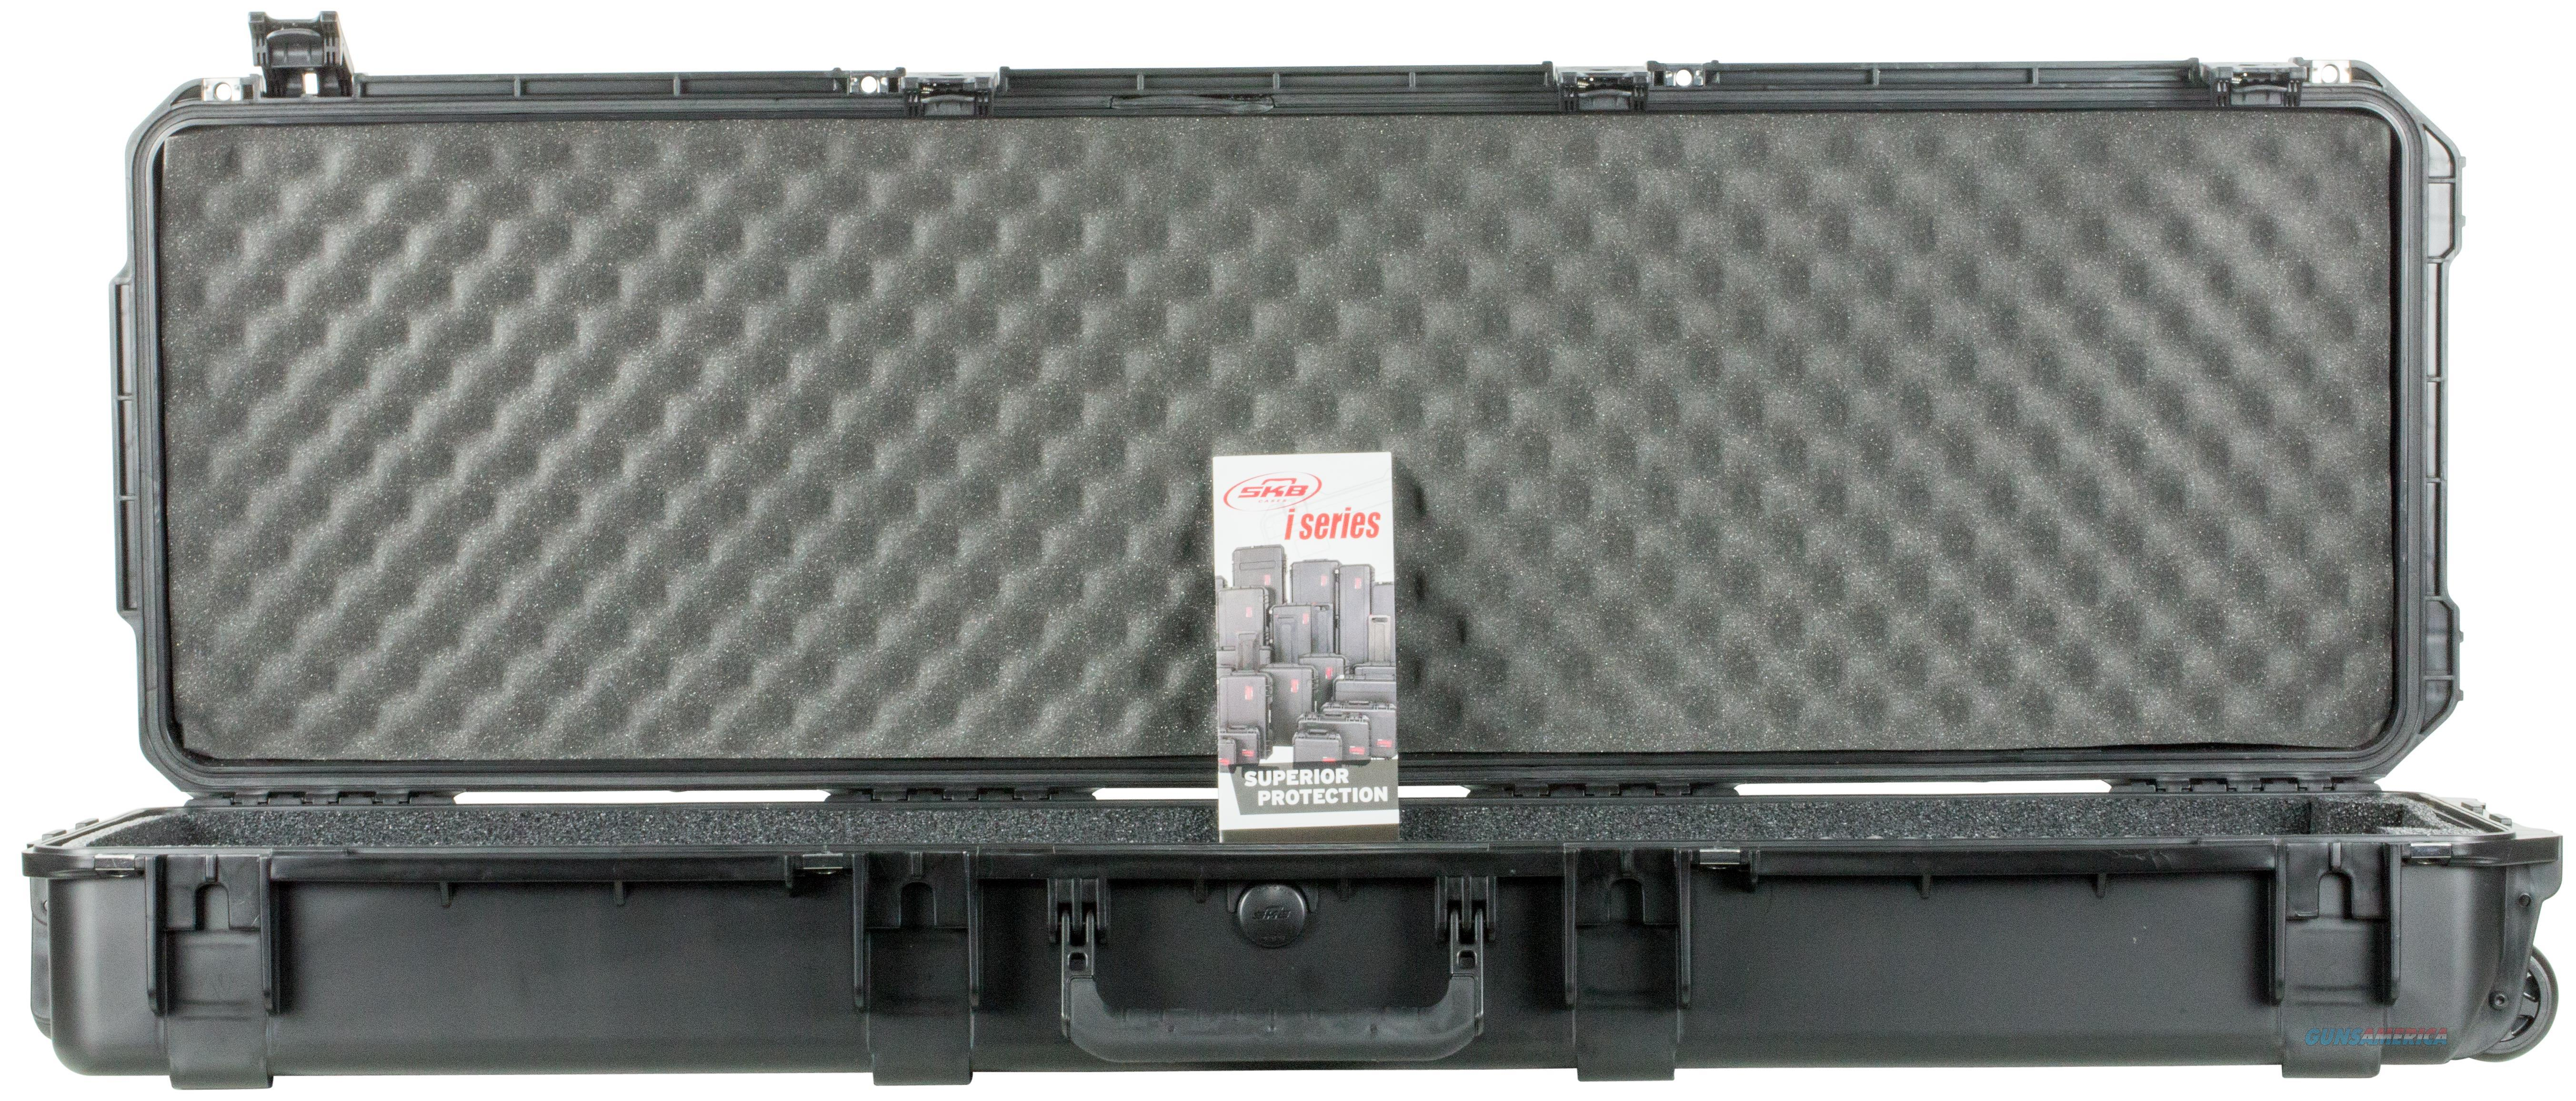 Skb 3I5014db Iseries Bow Case Polypropylene Matte 3I5014DB  Non-Guns > Gun Cases